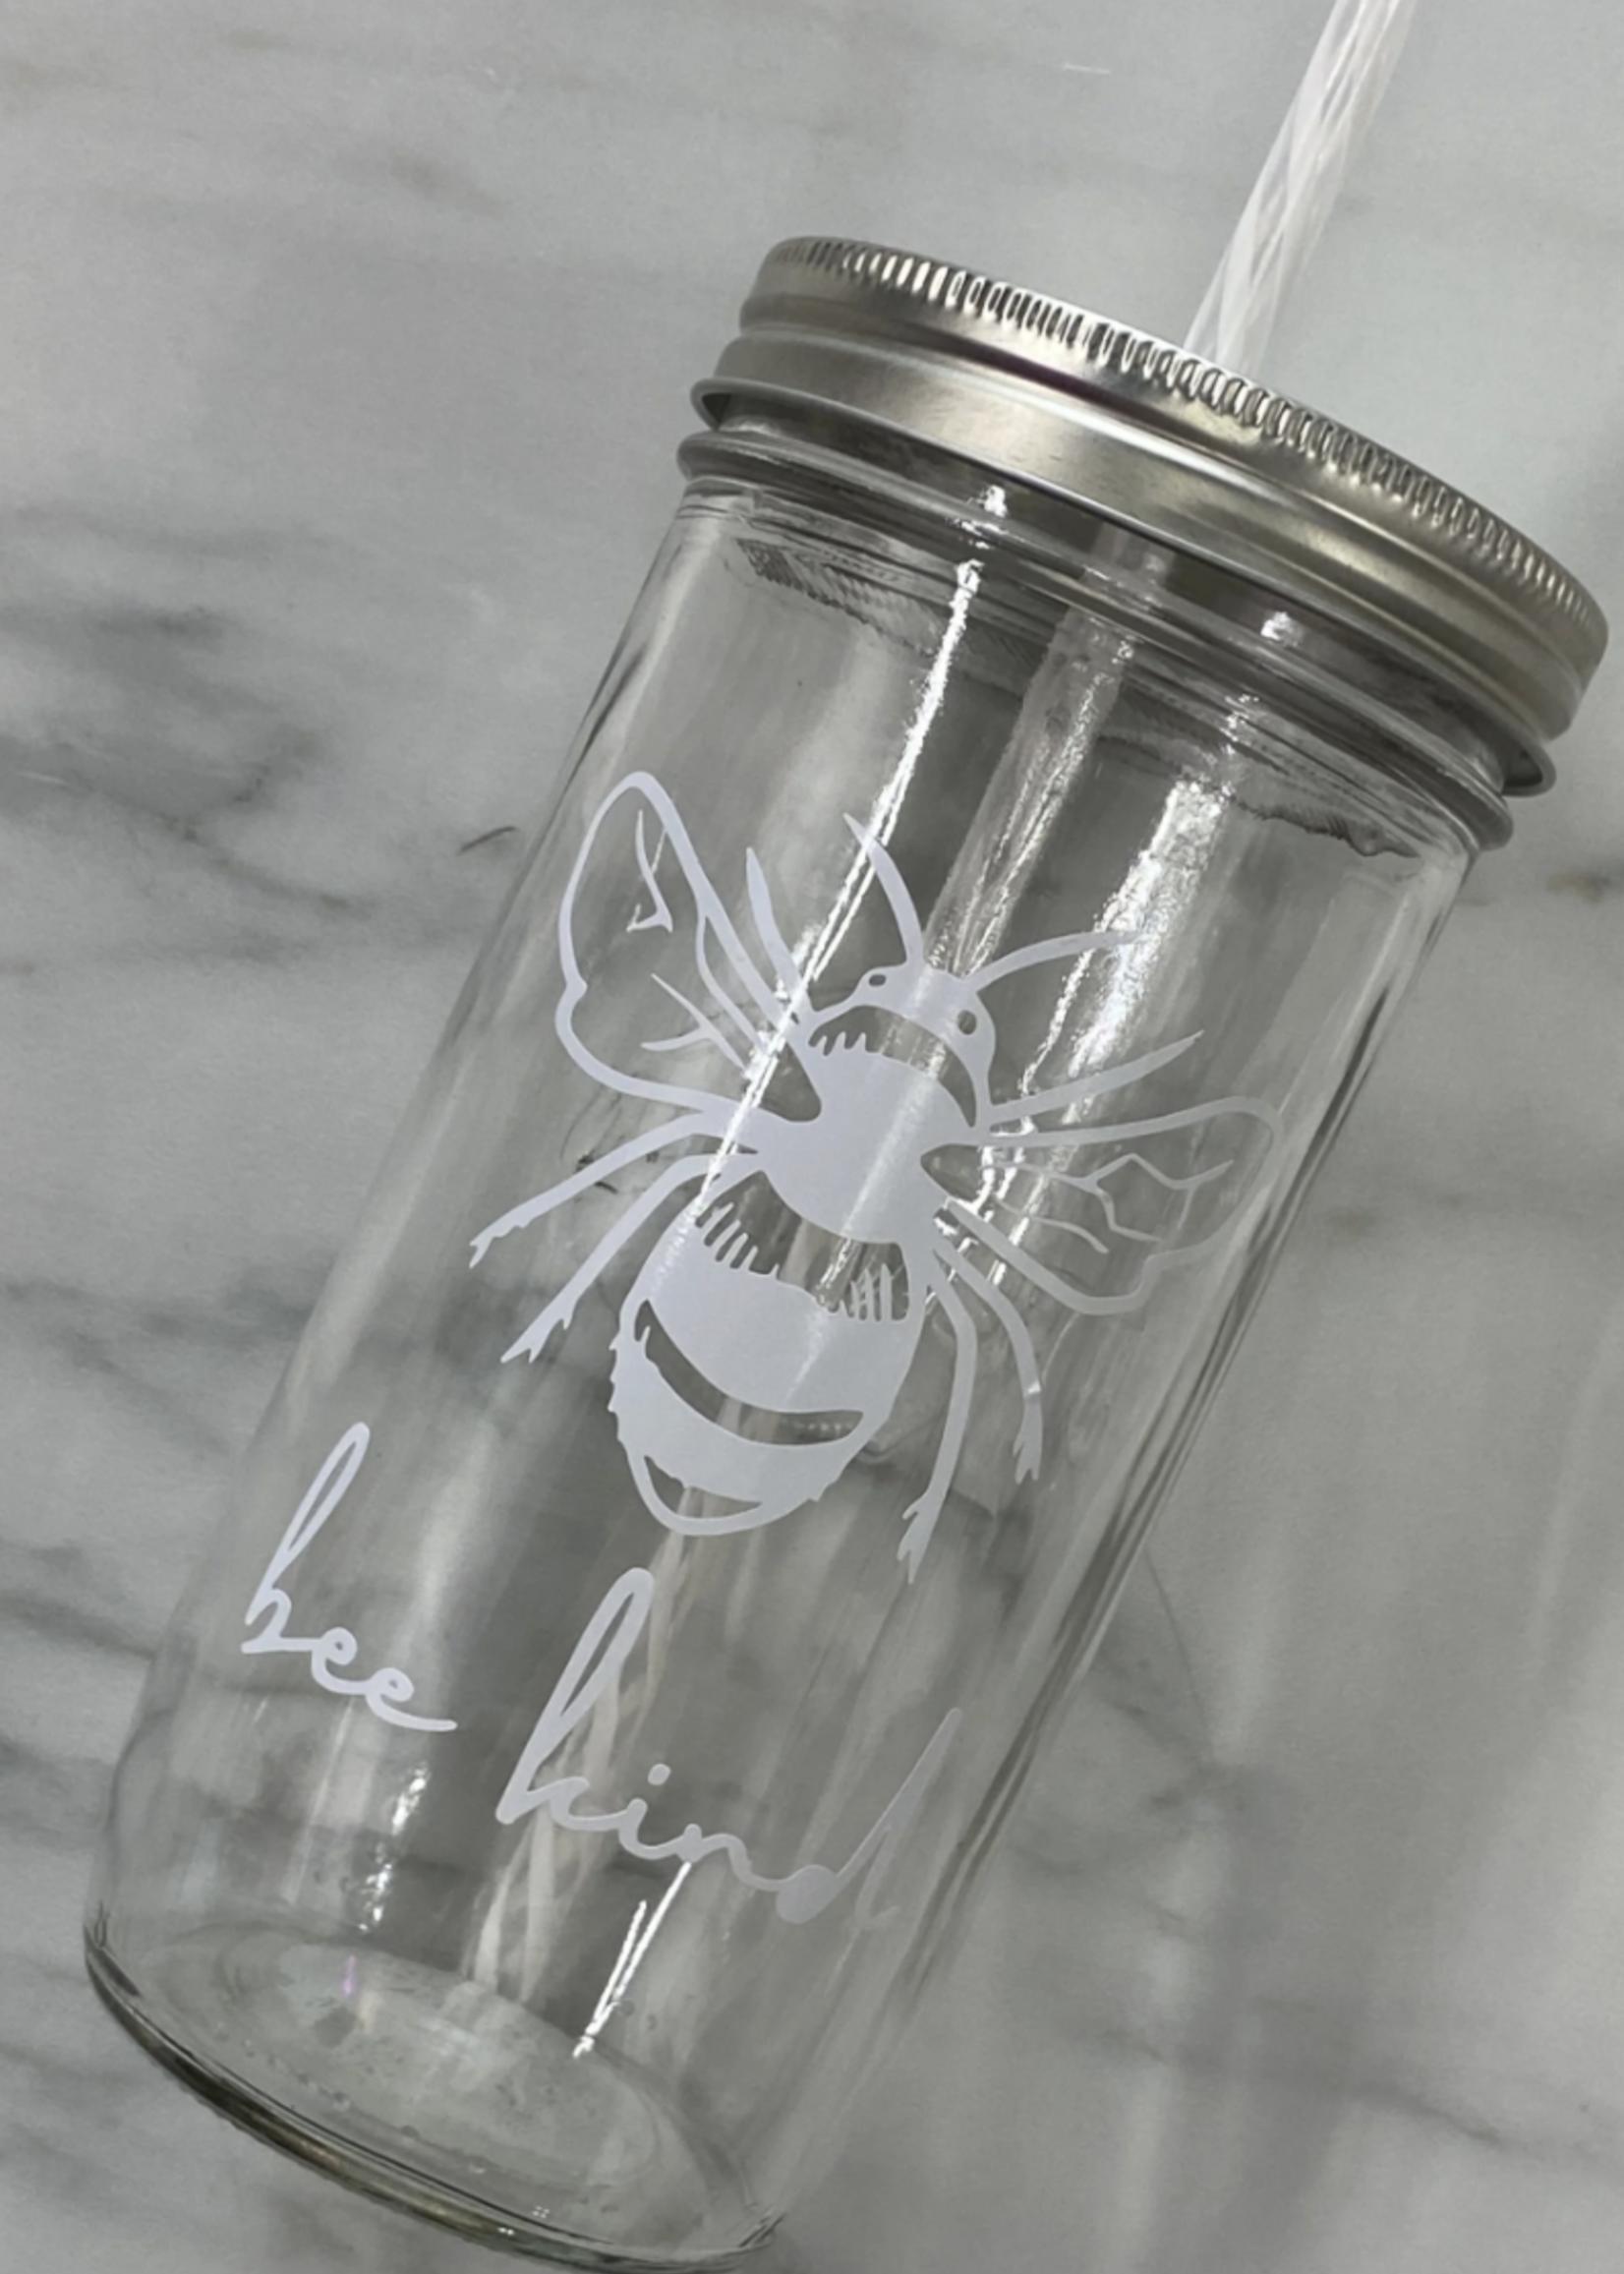 Kanga & Roo Craft Co Mason Jar Tumbler & Straw